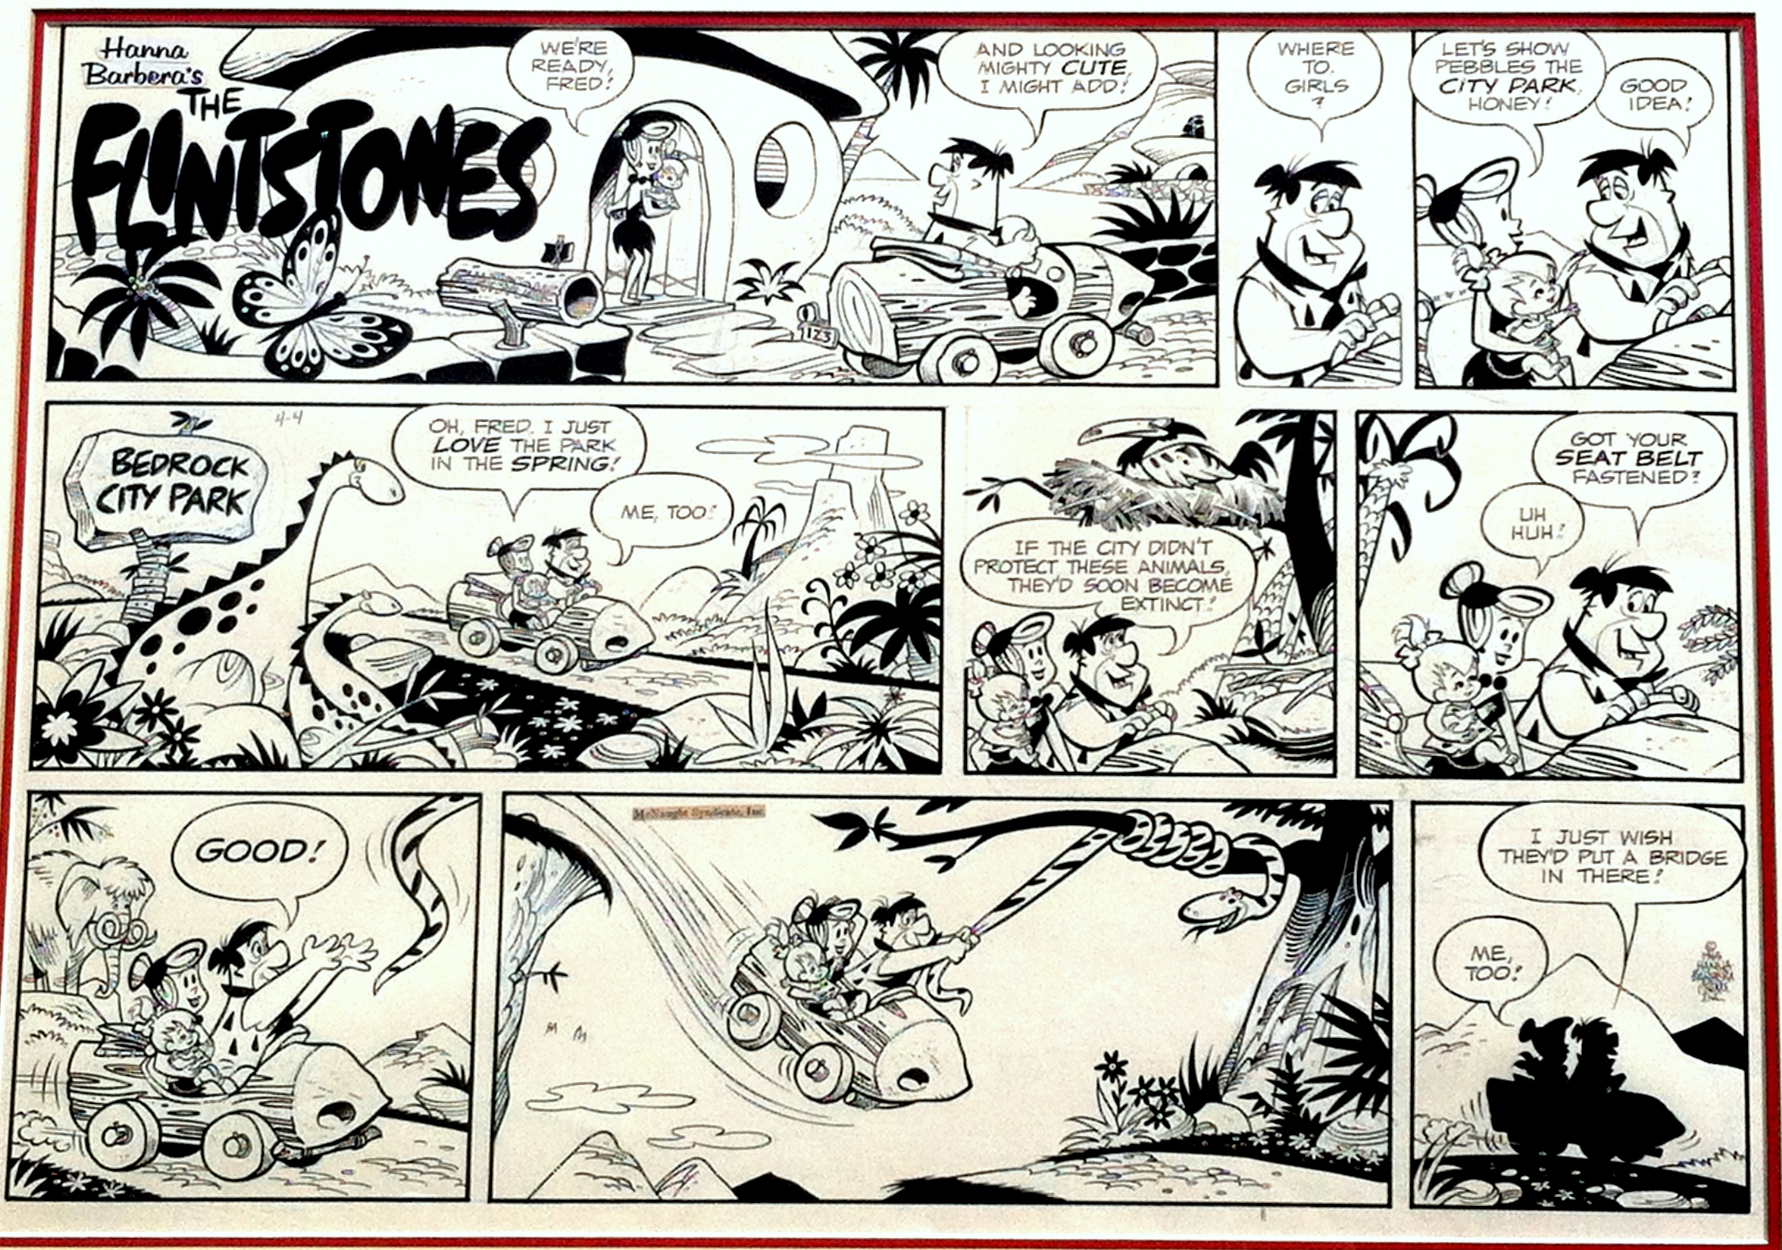 Comic strip art restoration